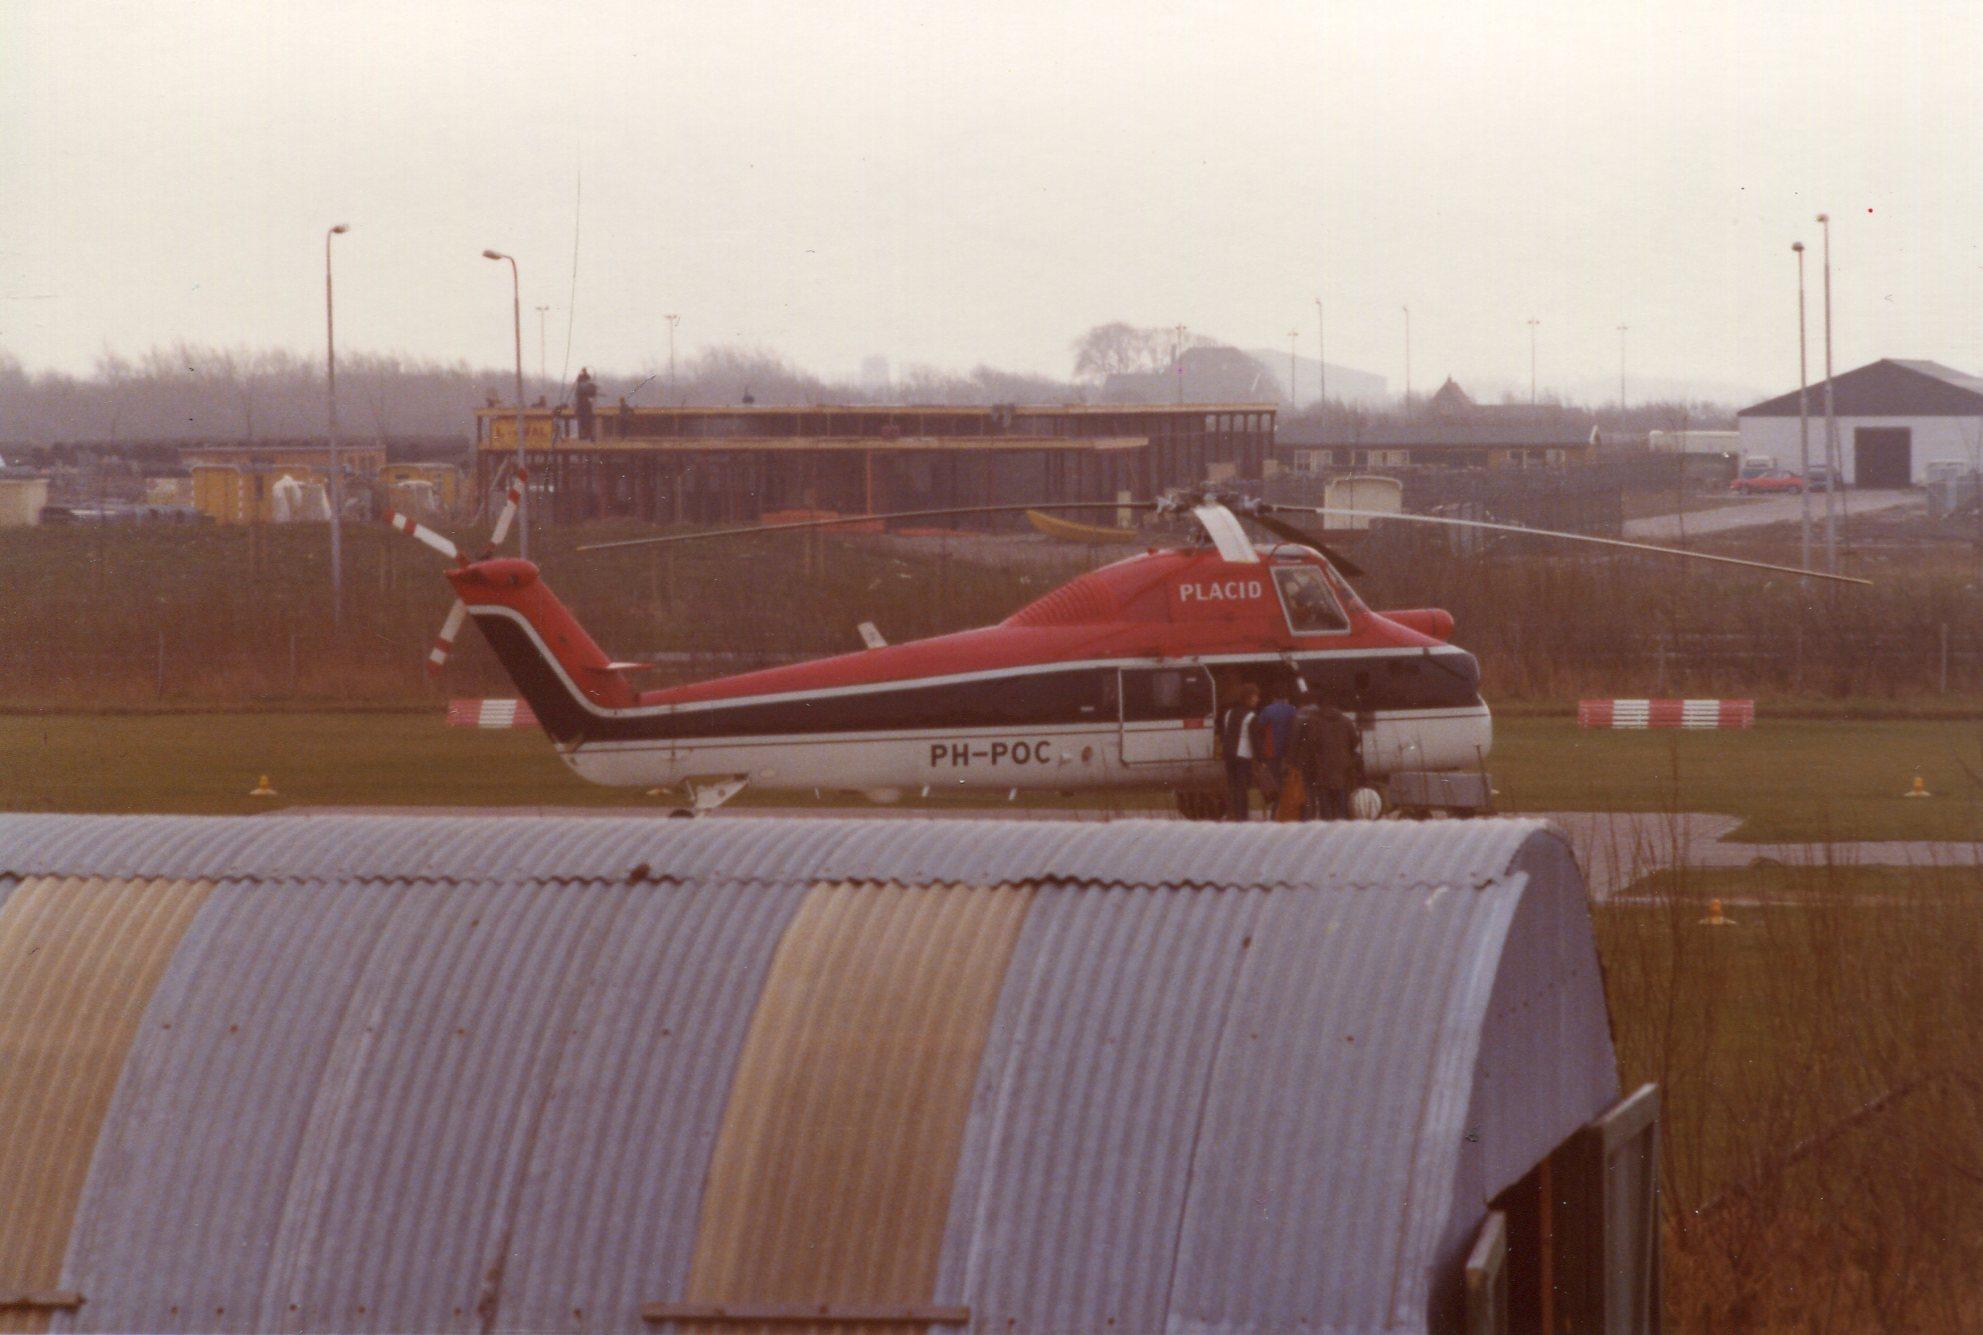 Naam: Den Helder , april 1977 (2).jpg Bekeken: 497 Grootte: 271,9 KB